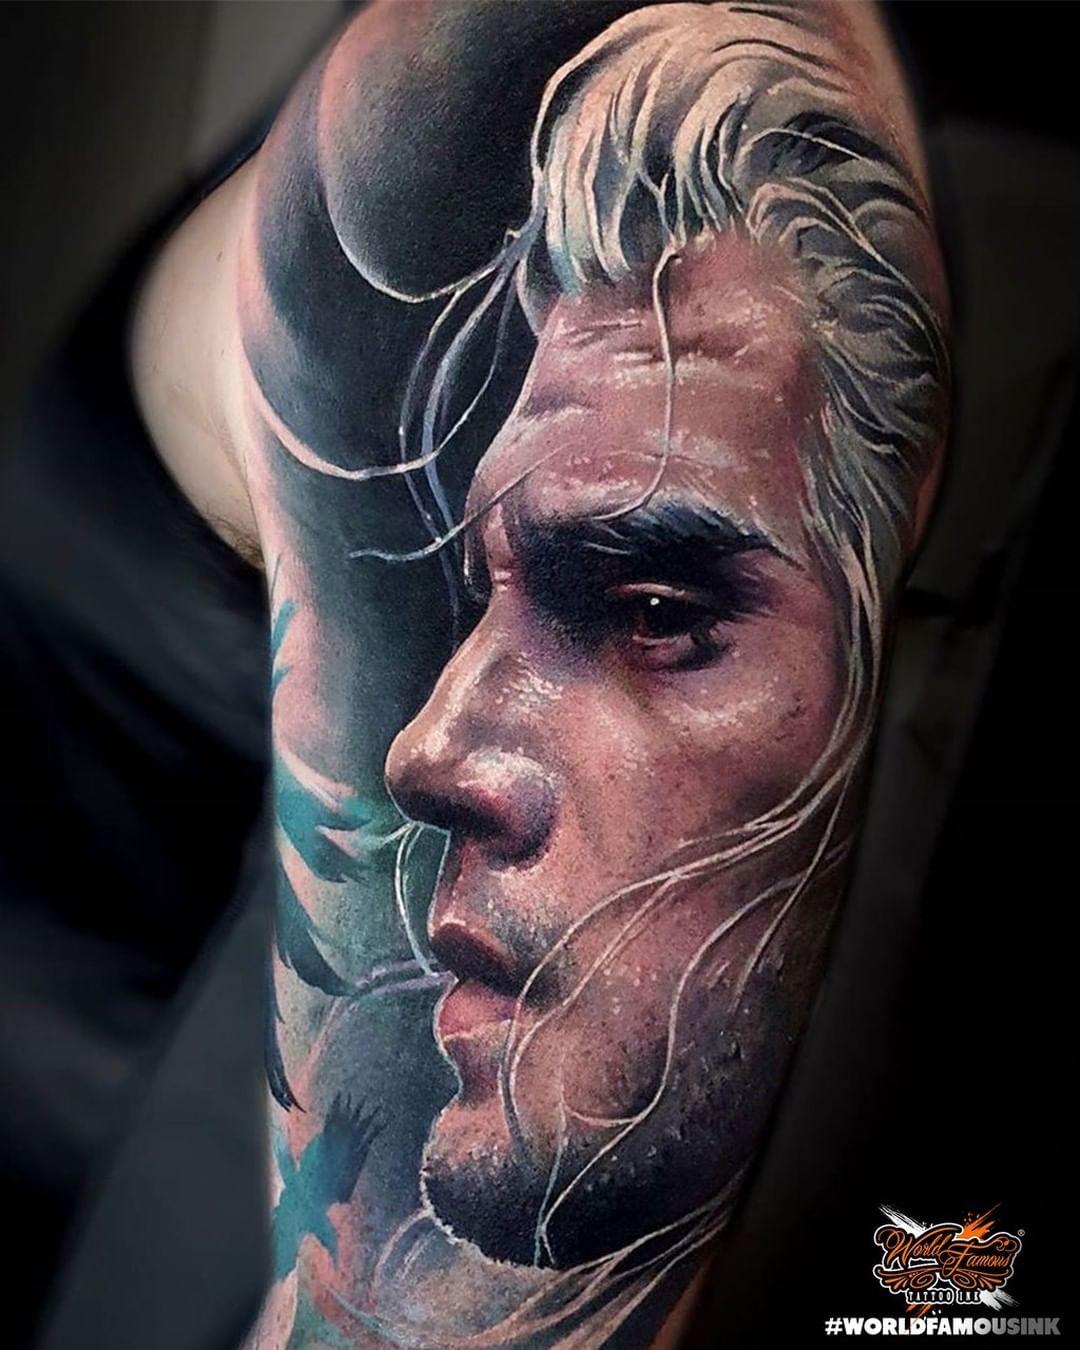 THE WITCHER by our sponsored artist @sandradaukshtatattoo using #worldfamousink 💪🏼 ➖ Follow us on instagram! ➖ #worldfamousforever #worldfamousfamily #worldfamoustattooink  #worldfamousproteam #tattoo #tattoos #tattoostyle #tattoomodel #tattooshop #tatuajes #tattooer #tattooartists #ink #inktattoo #inked #instatattoo #art #tattooing #lovetattoo #tattooconvention #vvsquidink #besttattoos #tattoolovers #tattooinspiration #tattooart #tattooidea #tattooed #tattooink #unitedink